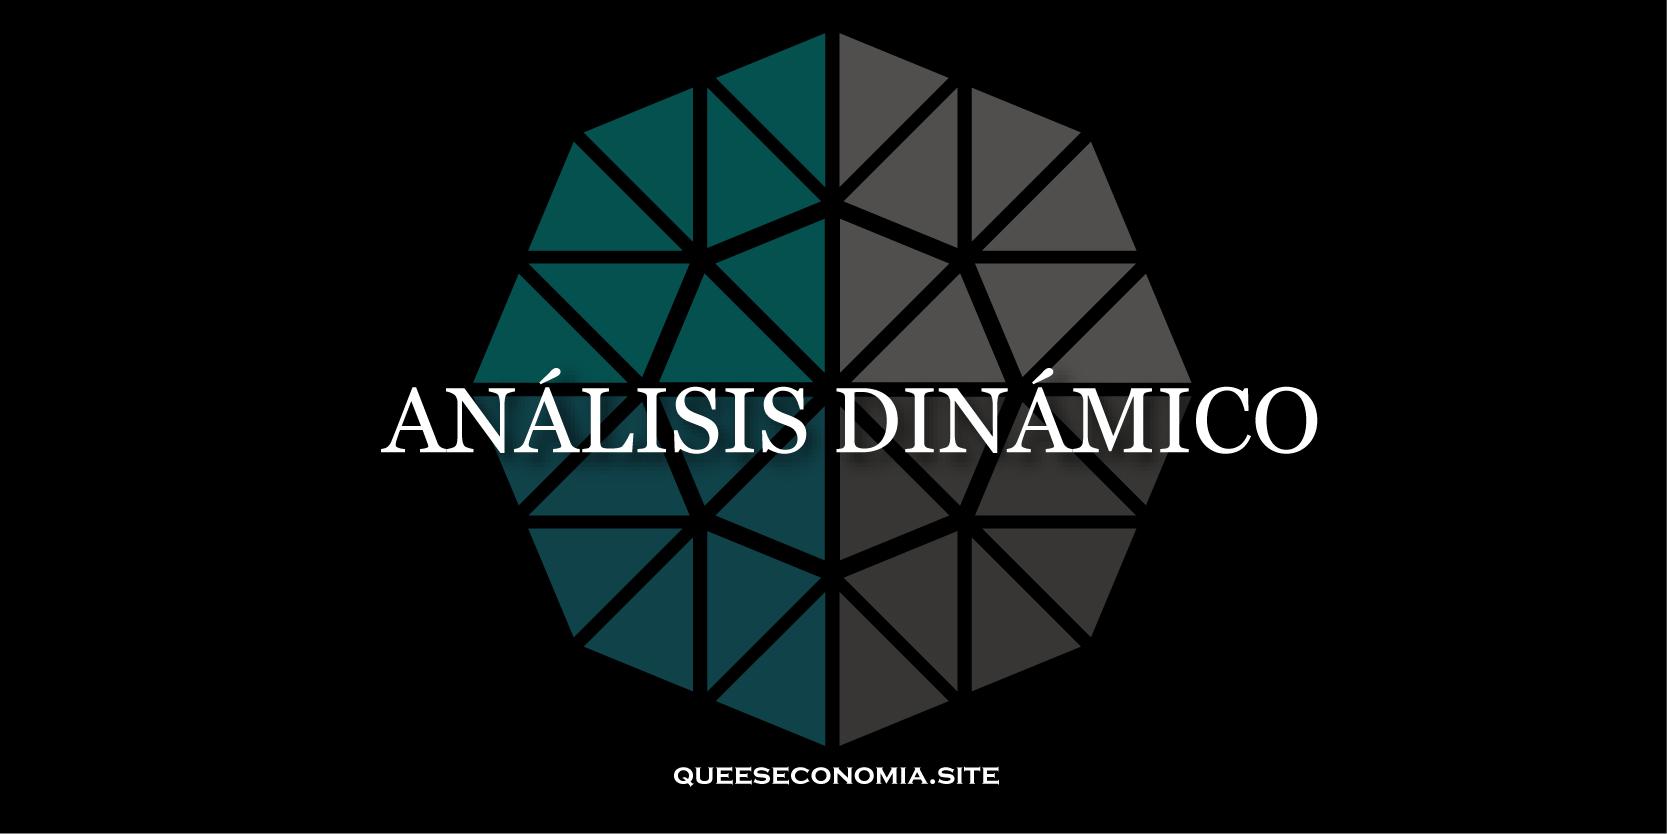 análisis dinámico